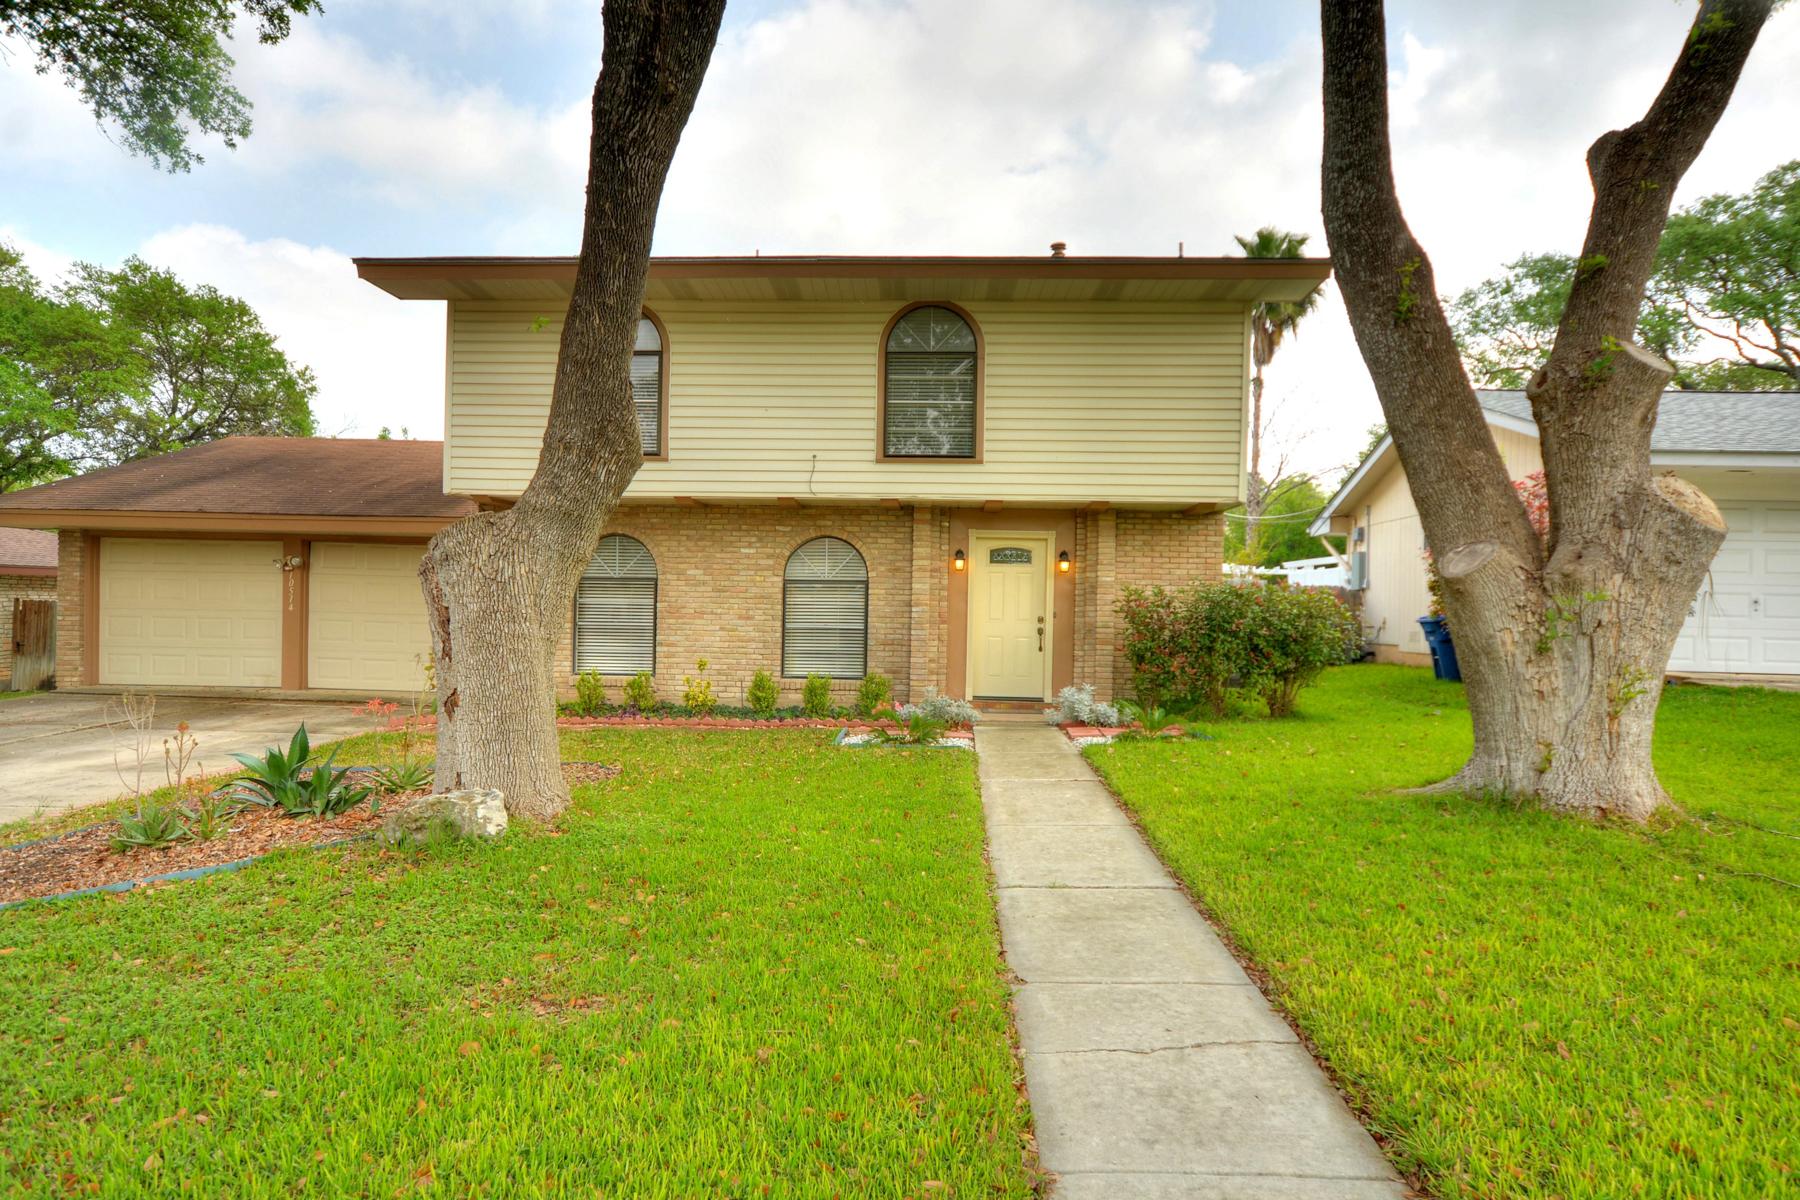 独户住宅 为 销售 在 Beautiful Remodeled Home in The Summit 10514 Millspring Dr 圣安东尼奥, 得克萨斯州, 78230 美国